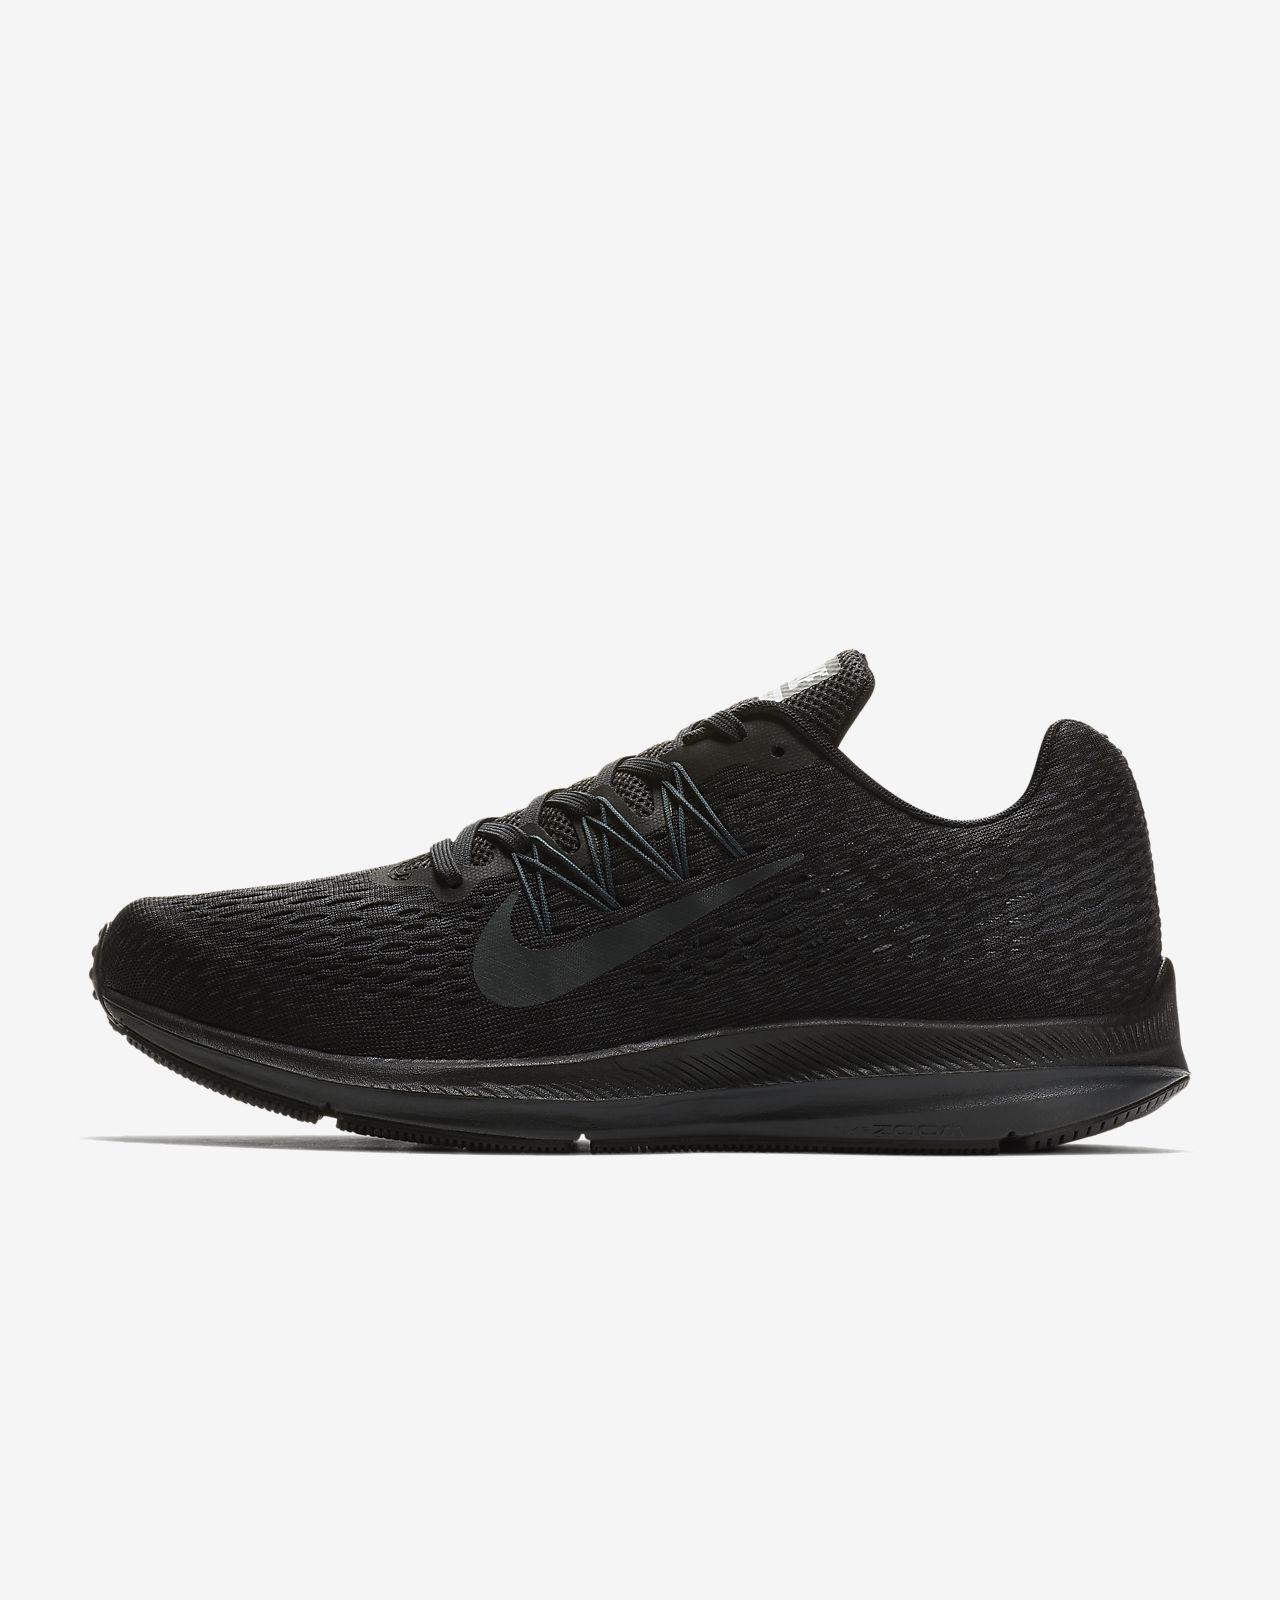 Мужские беговые кроссовки Nike Air Zoom Winflo 5